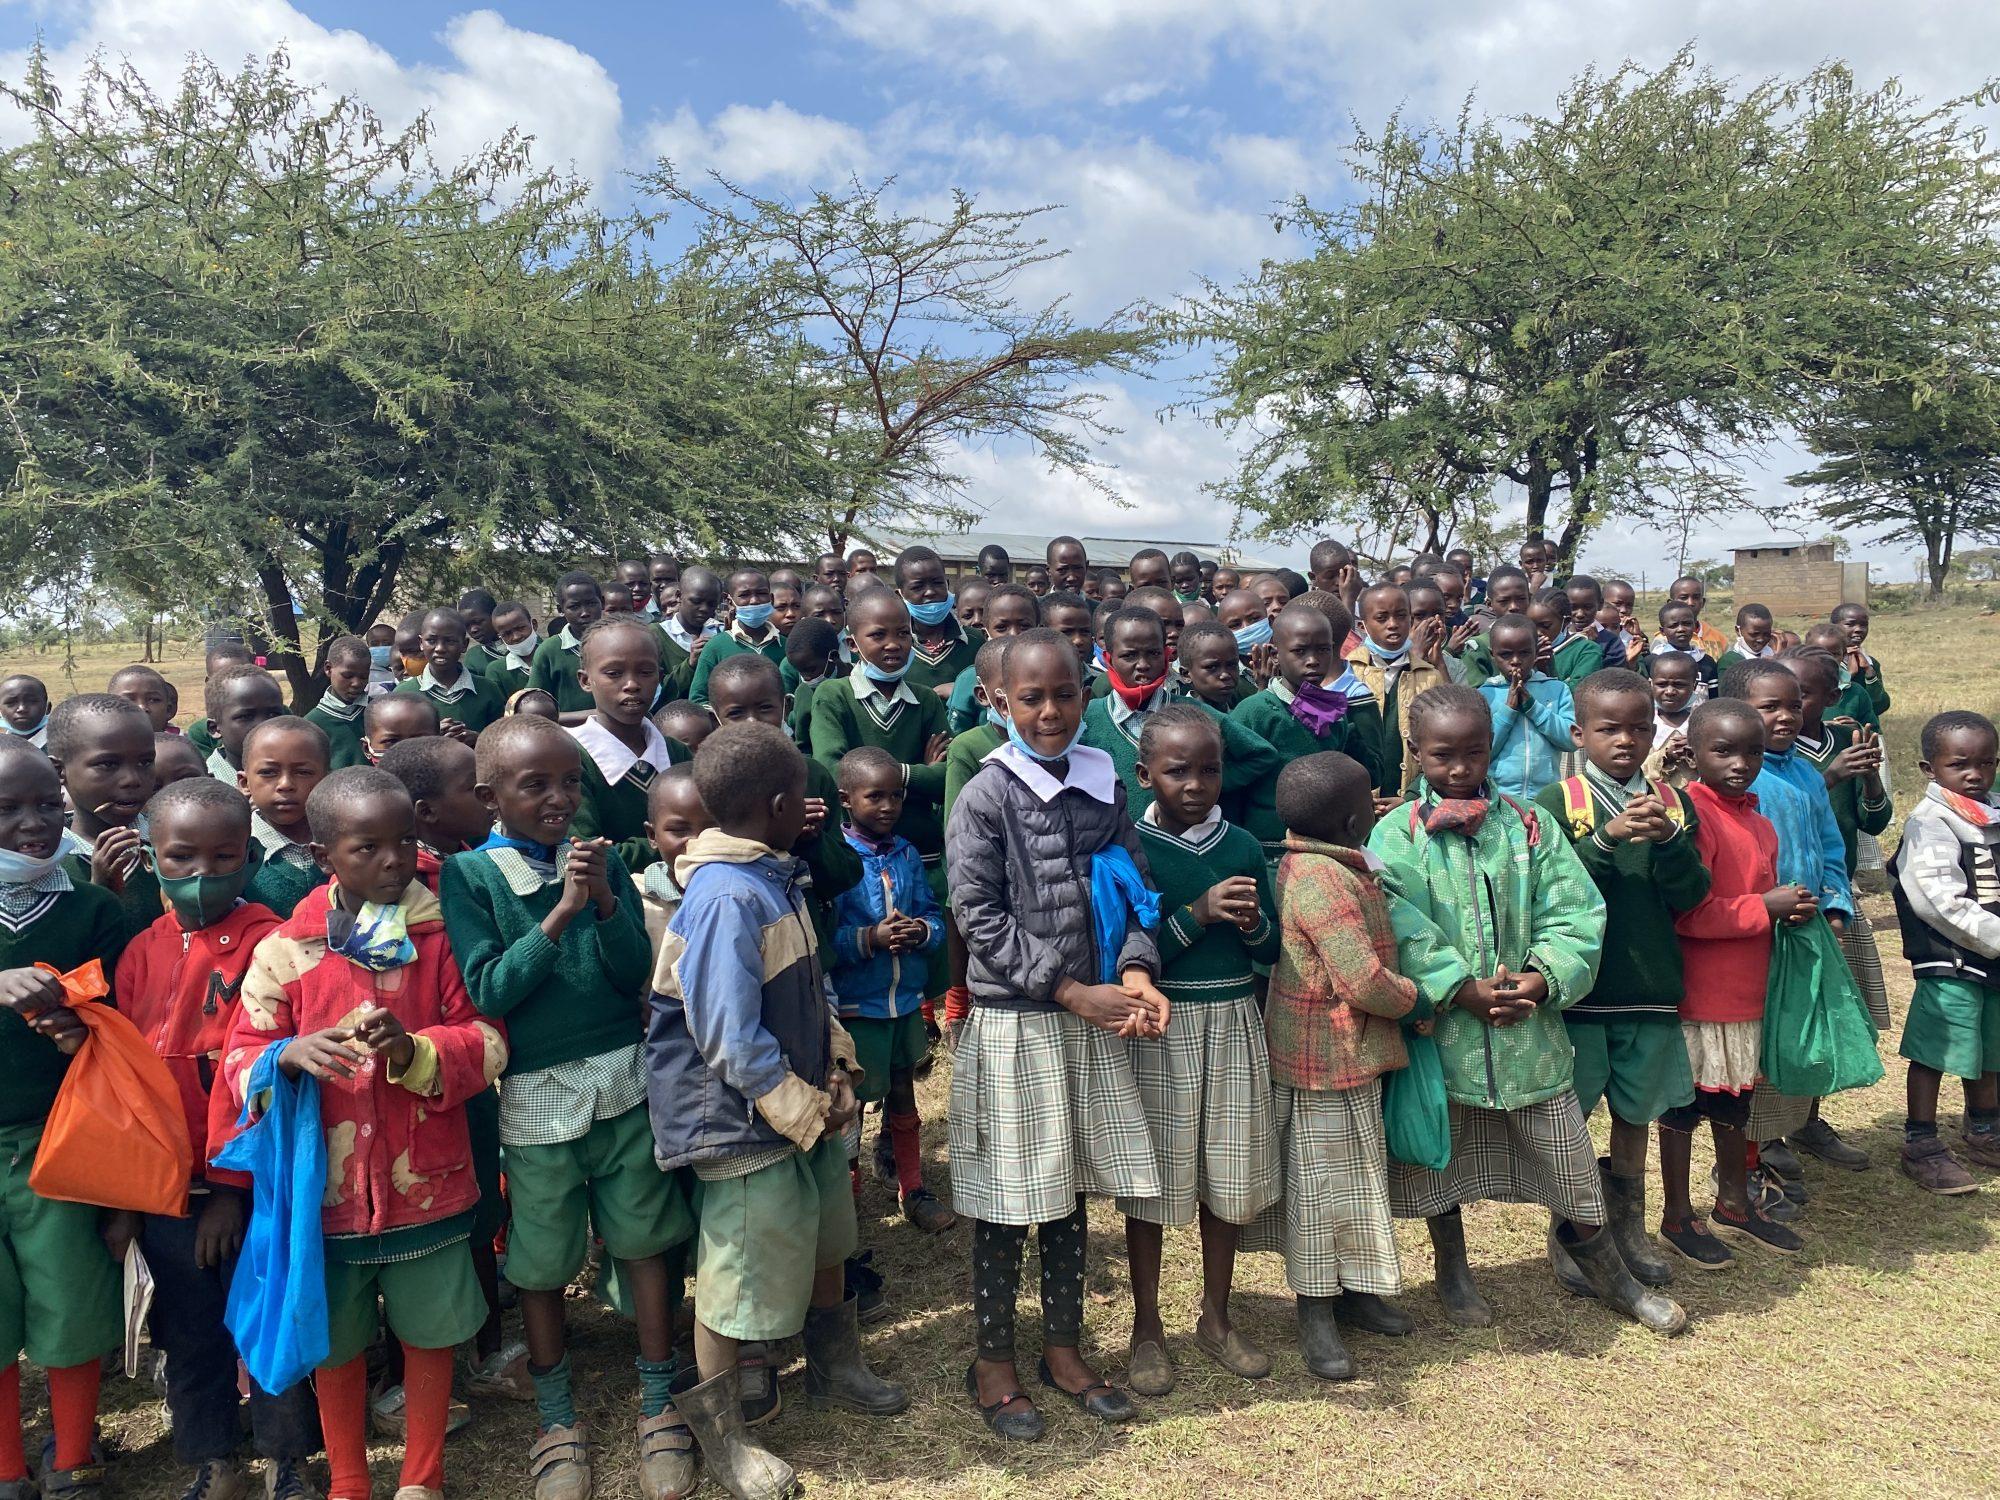 Kenyan girls, impoverished communities suffer in pandemic fallout